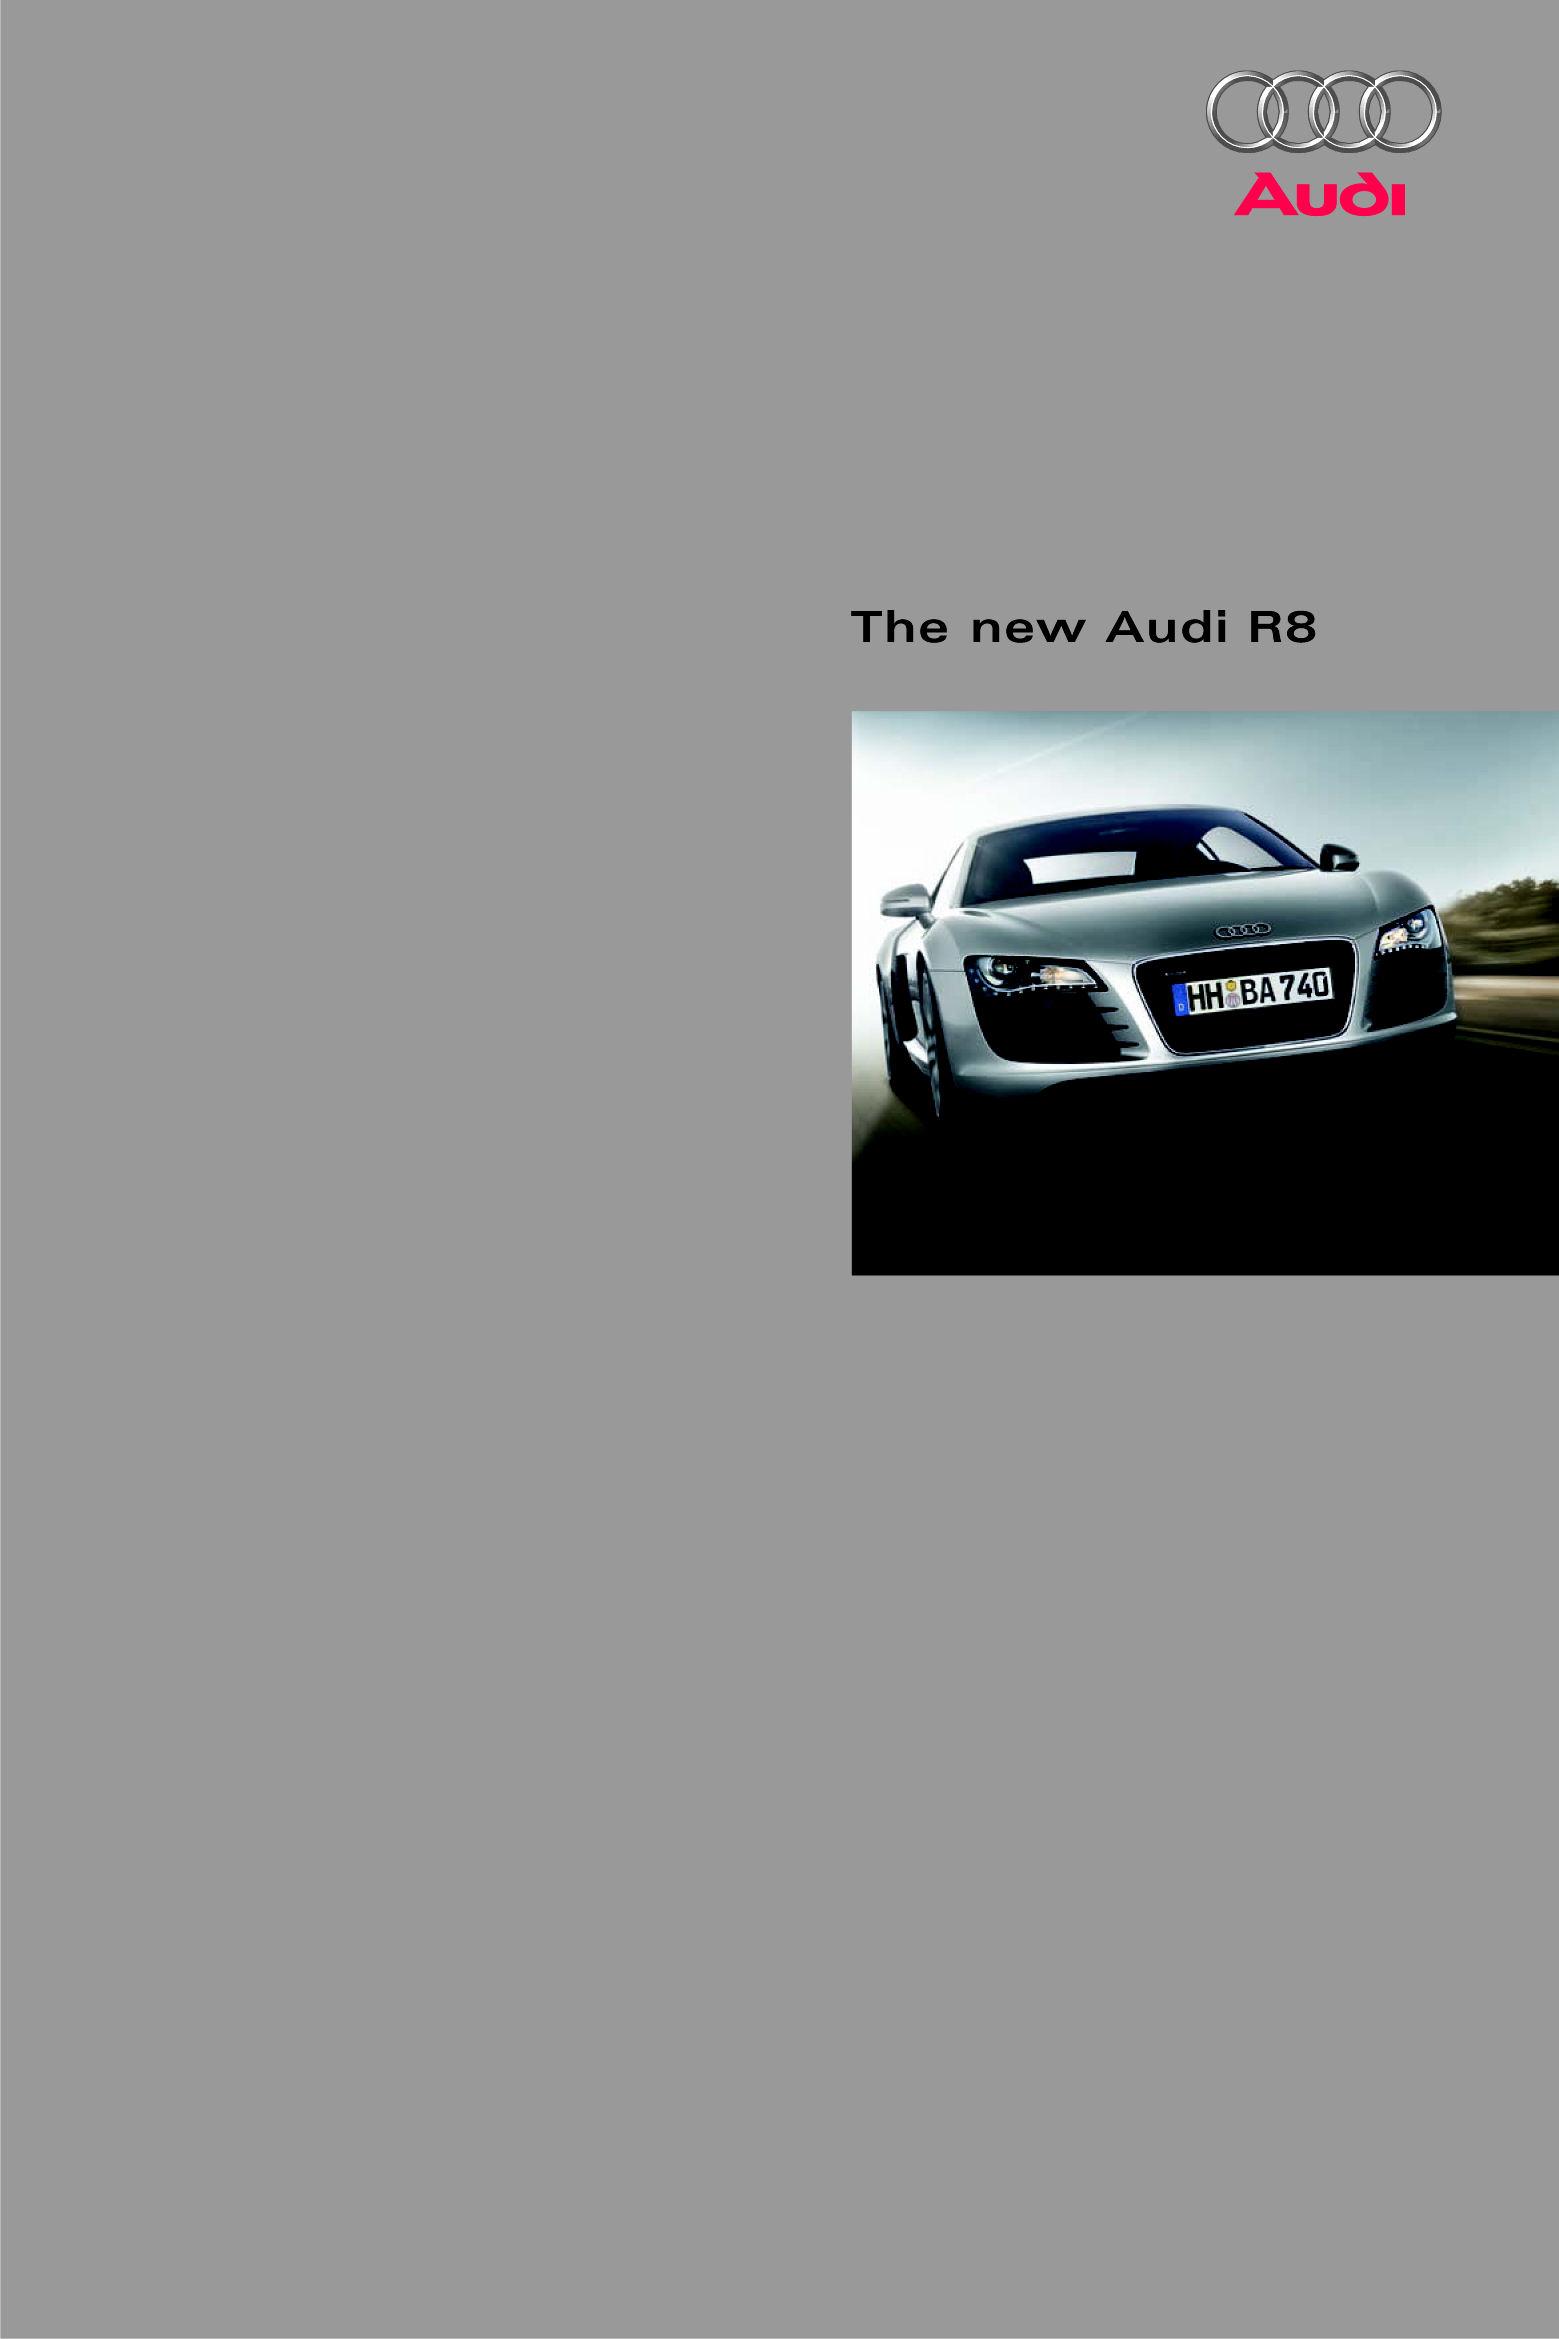 2007 Audi R8 Brochure